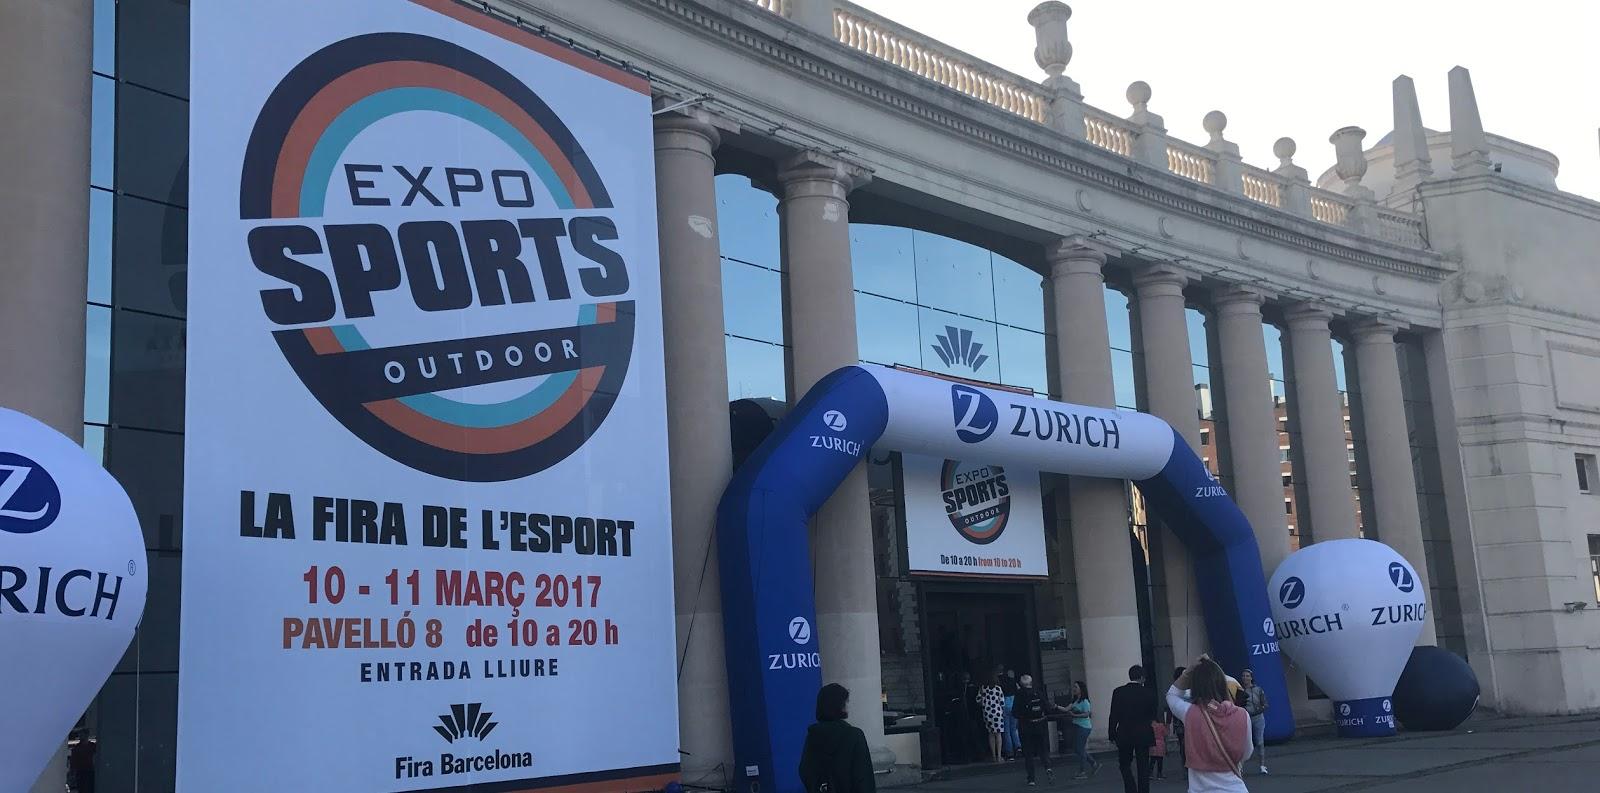 Expo Sports -  Zurich Marató de Barcelona 2017